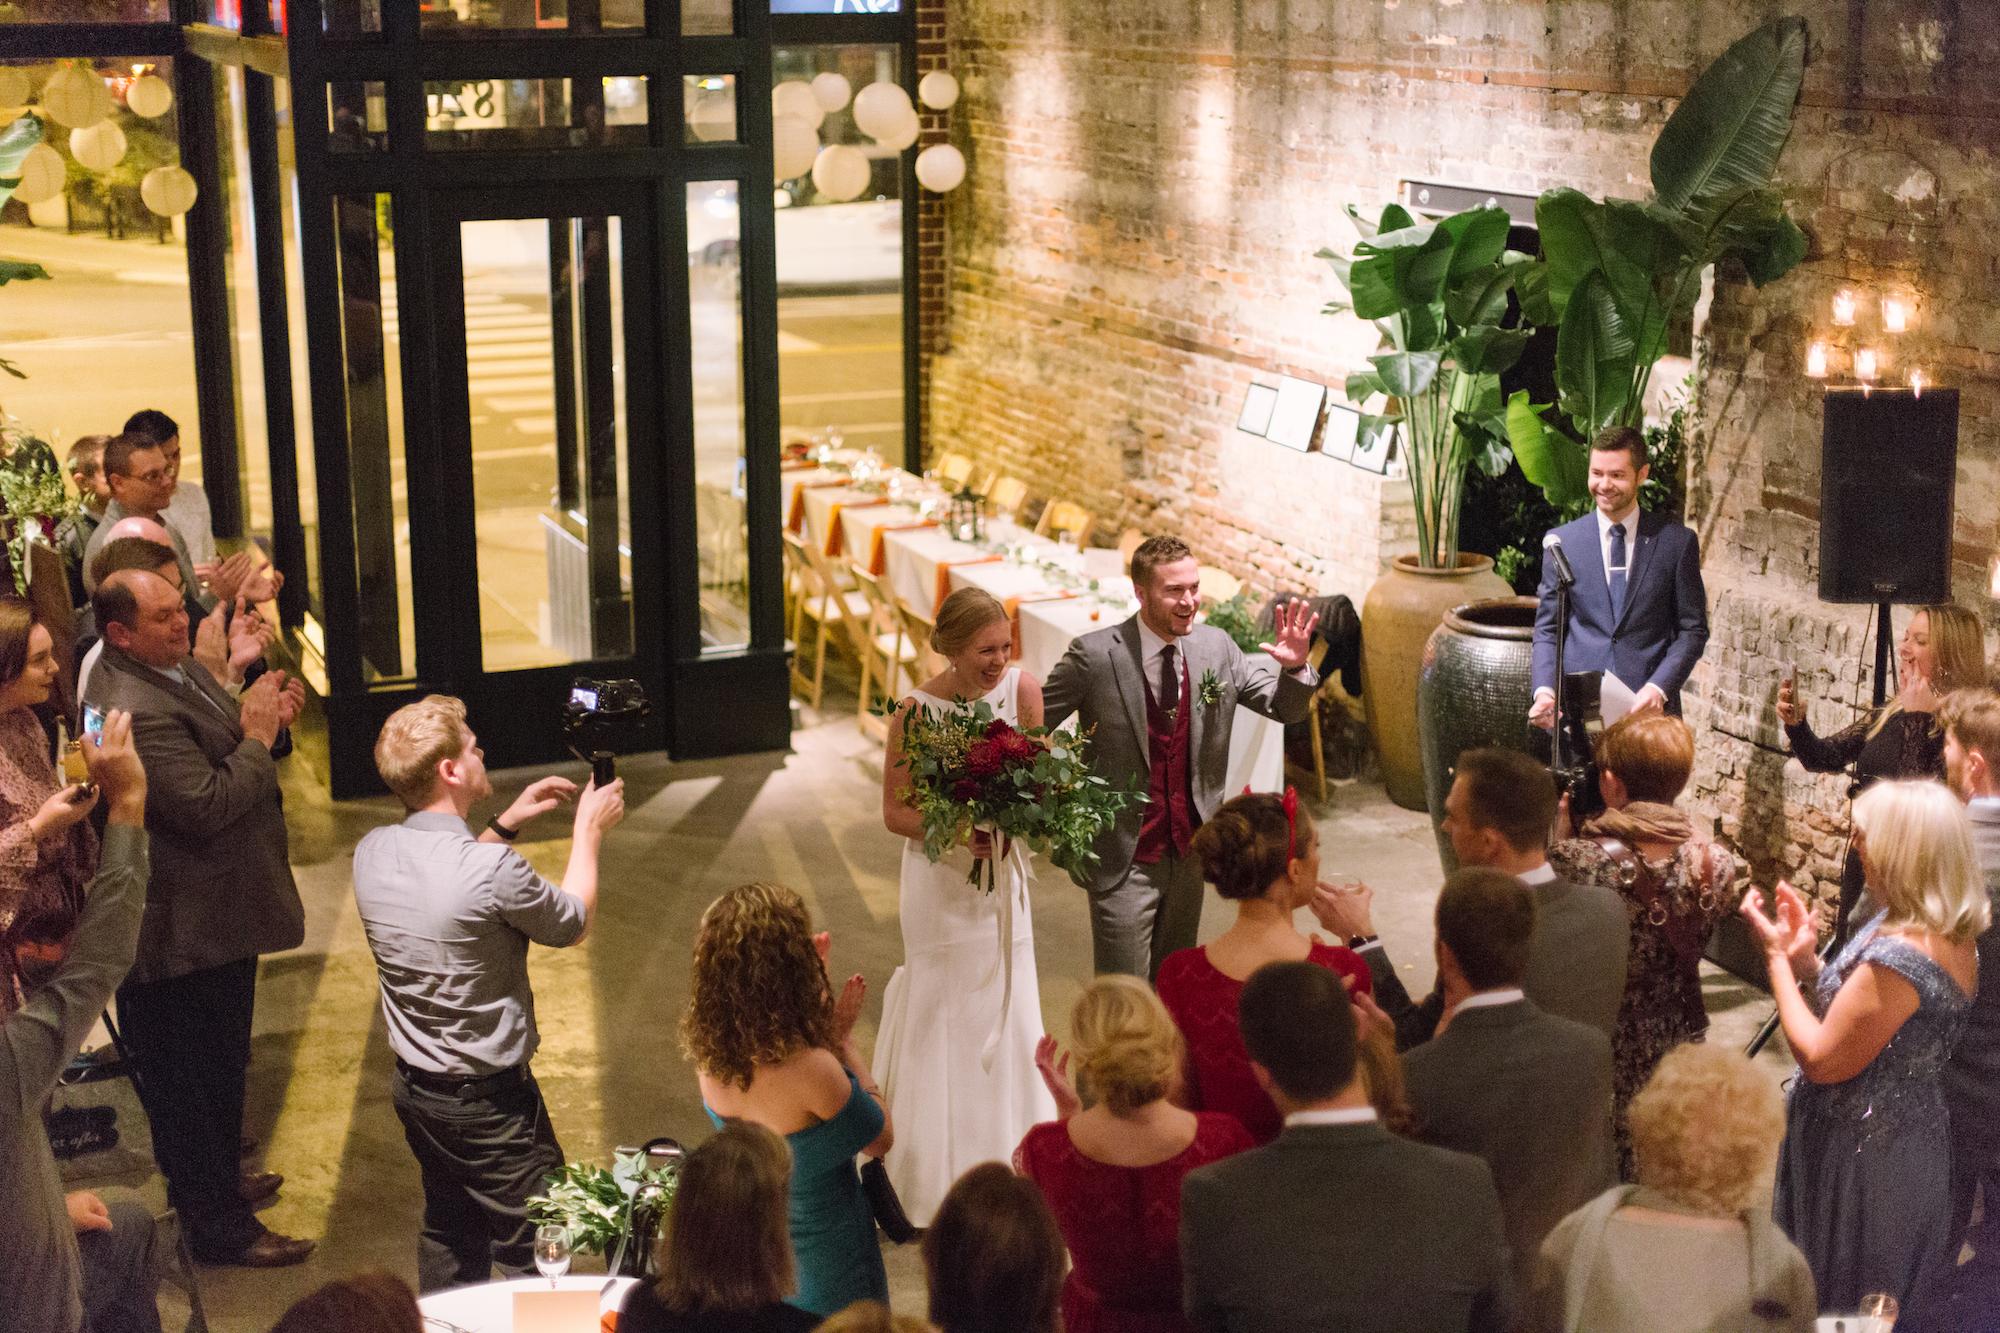 Sarah & Dan - Chicago, ILVenue: A New LeafPhotographer: Geneva Boyett